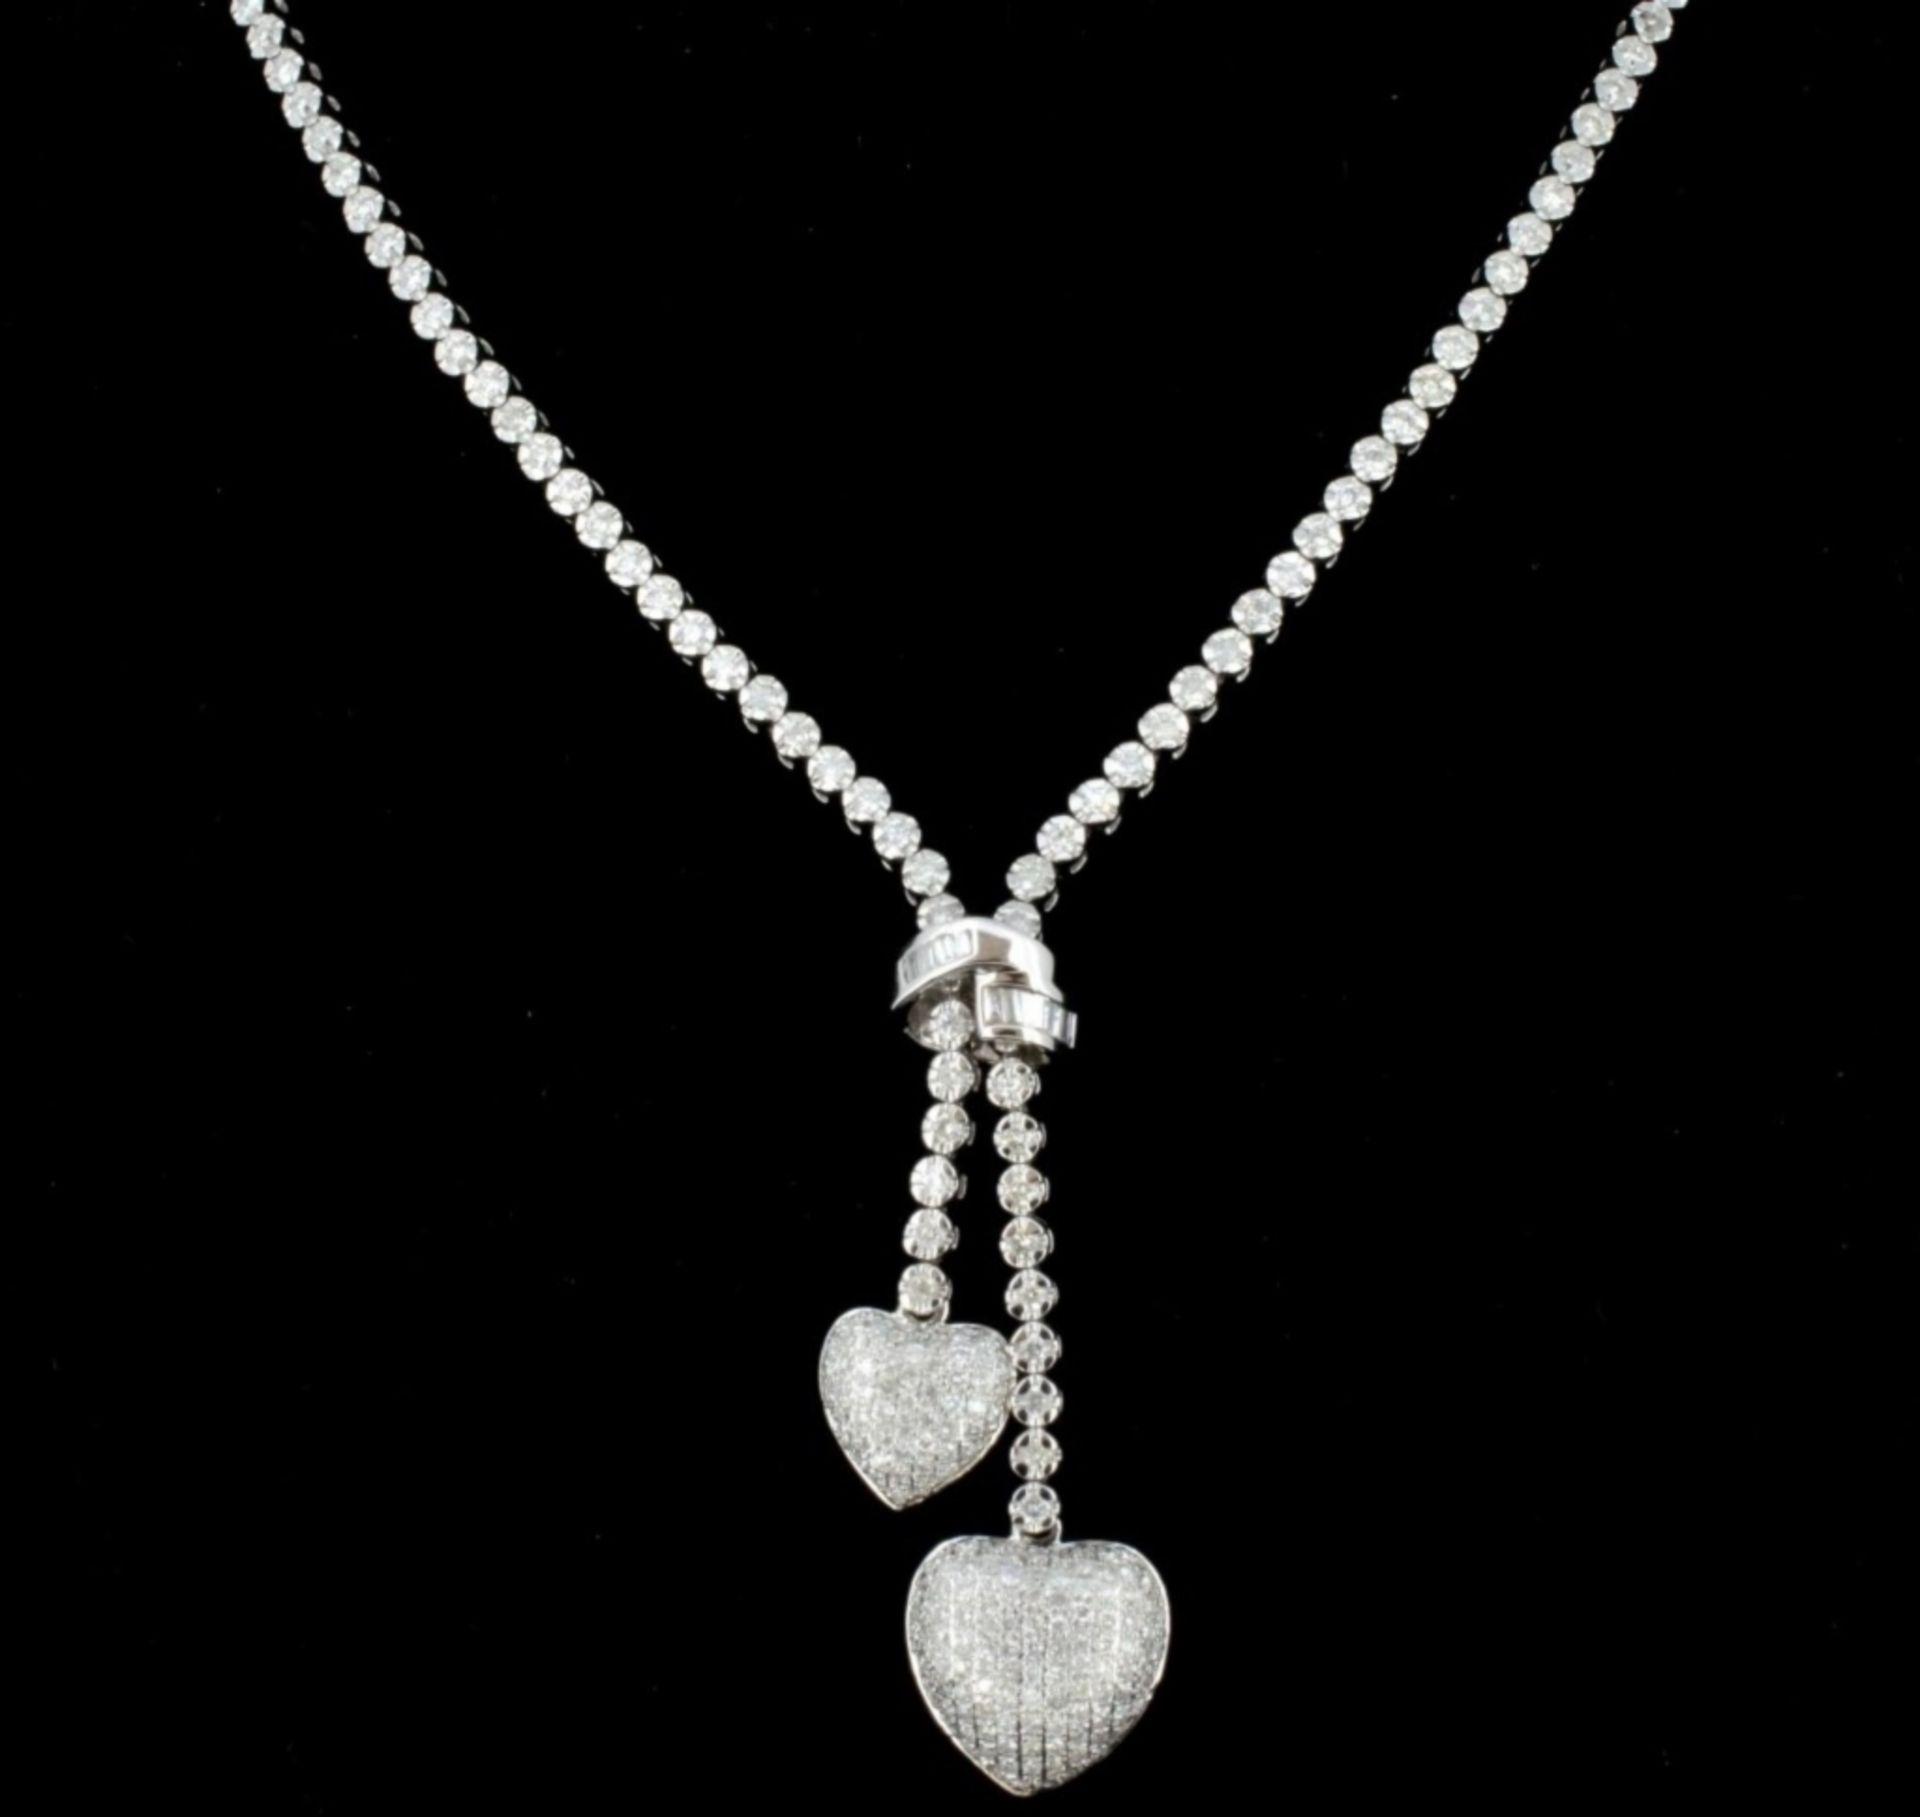 14K White Gold 2.82ct Lariat Style Diamond Neckla - Image 2 of 3